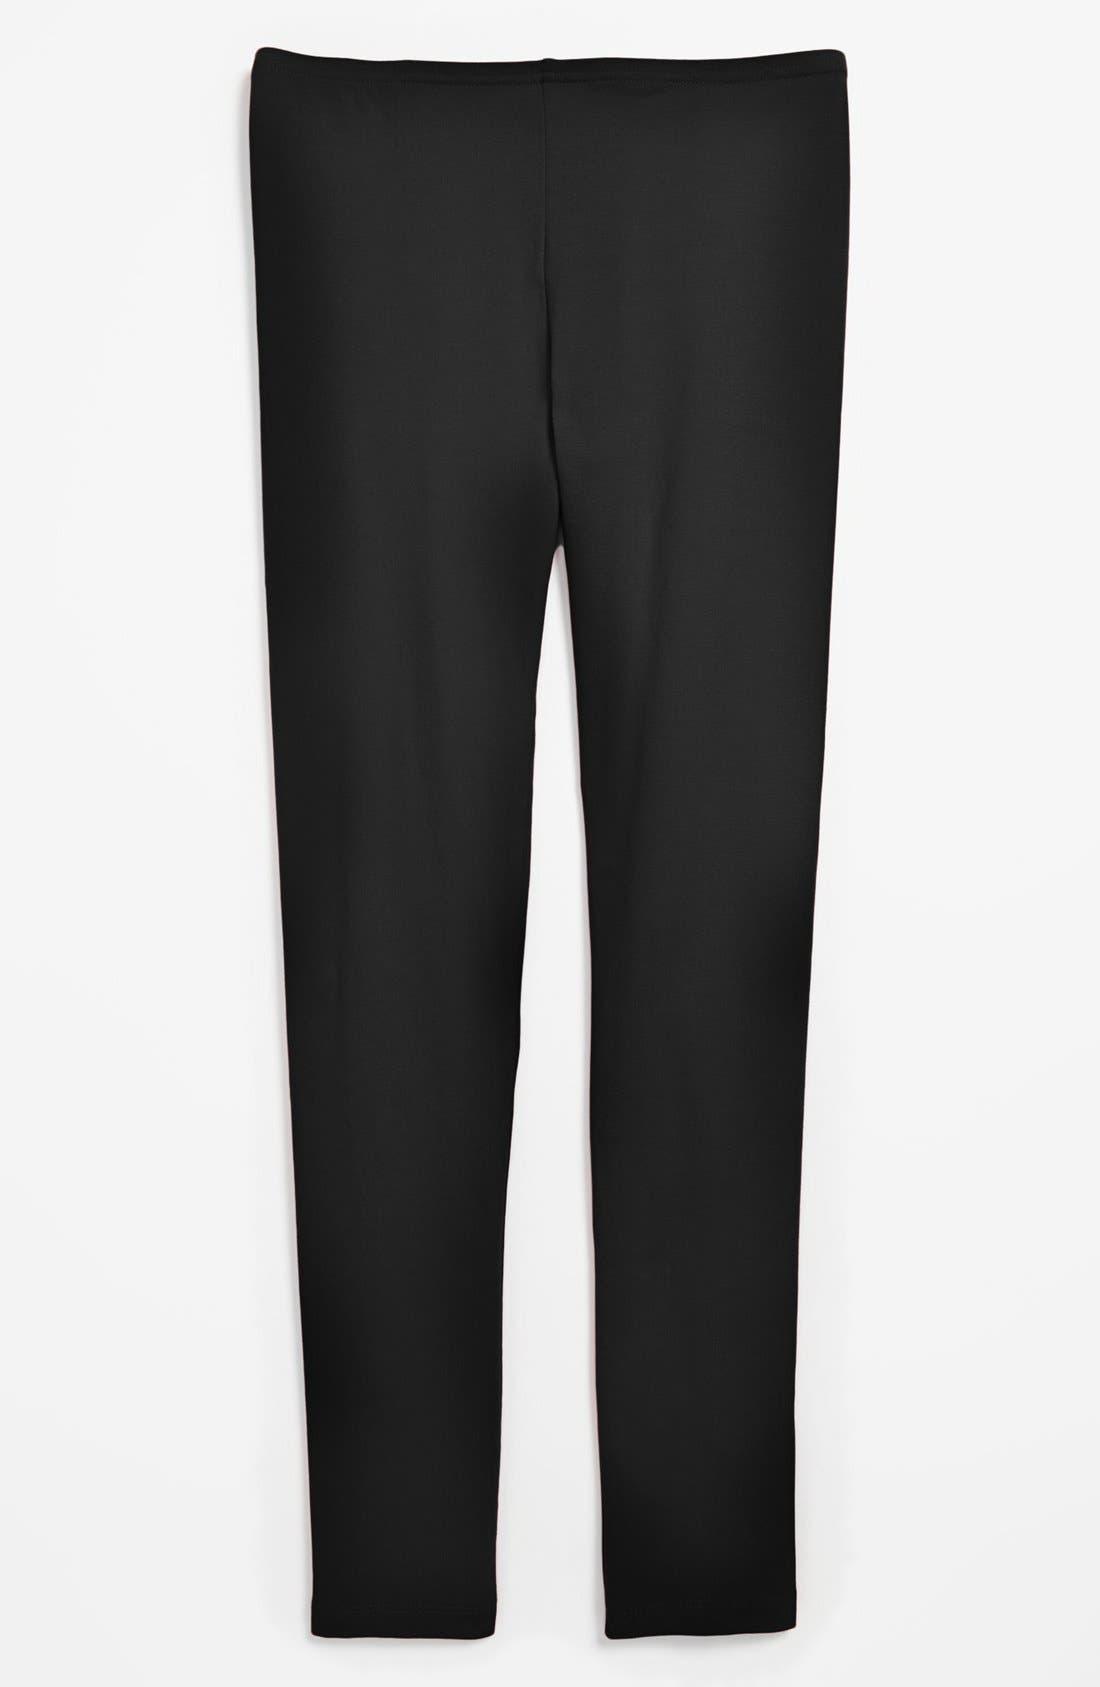 TUCKER + TATE 'Core' Leggings, Main, color, BLACK